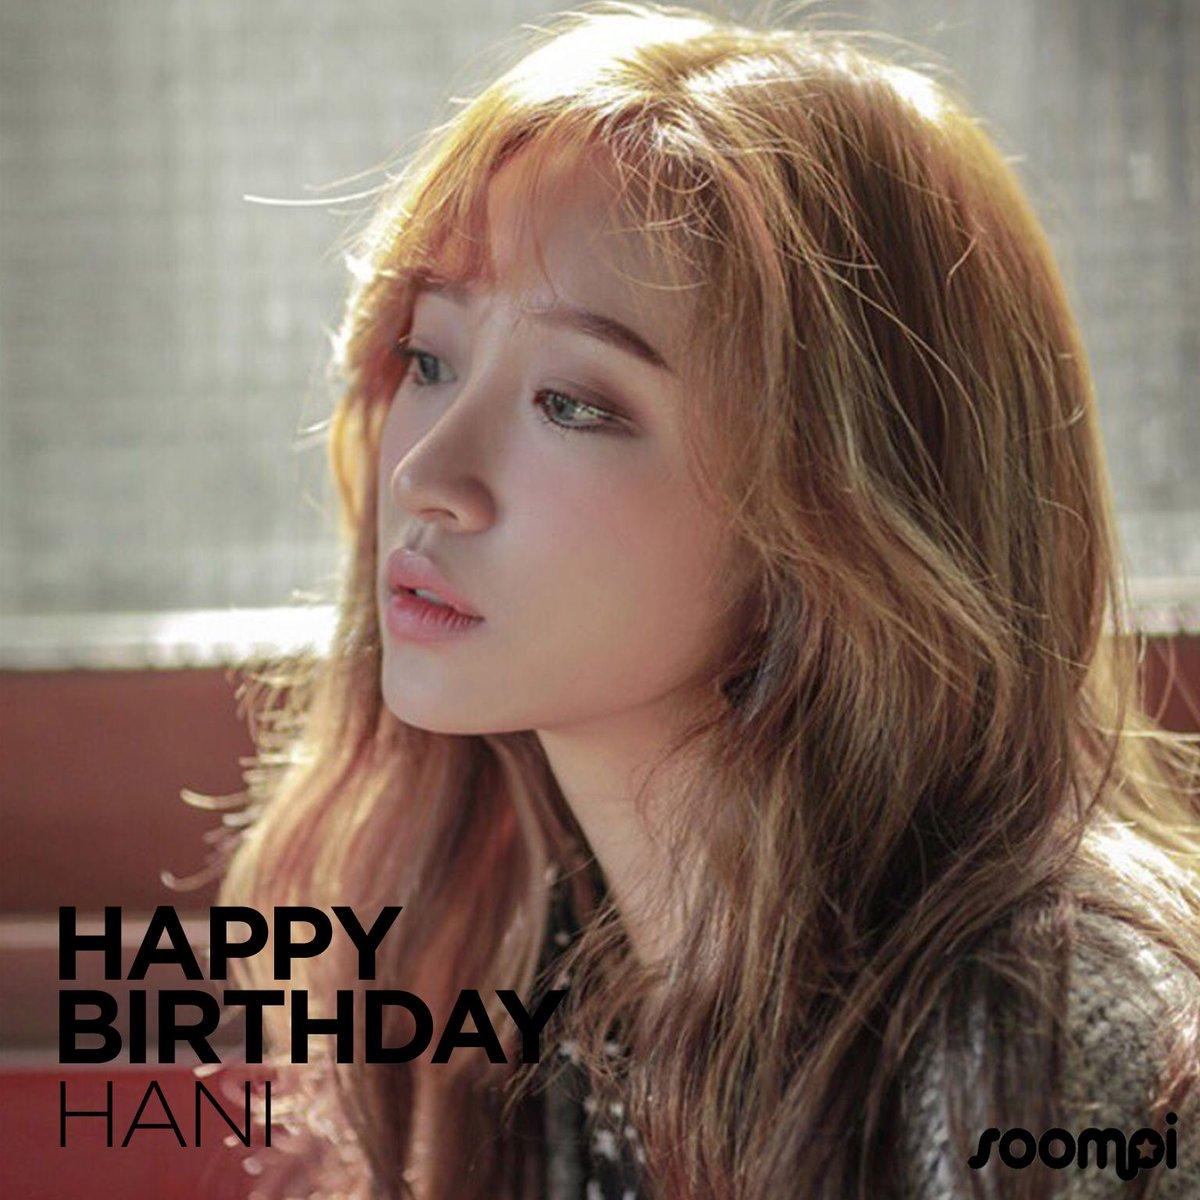 Happy Birthday to #EXID's Hani! #HappyHaniDay https://t.co/sQrke0FN88...